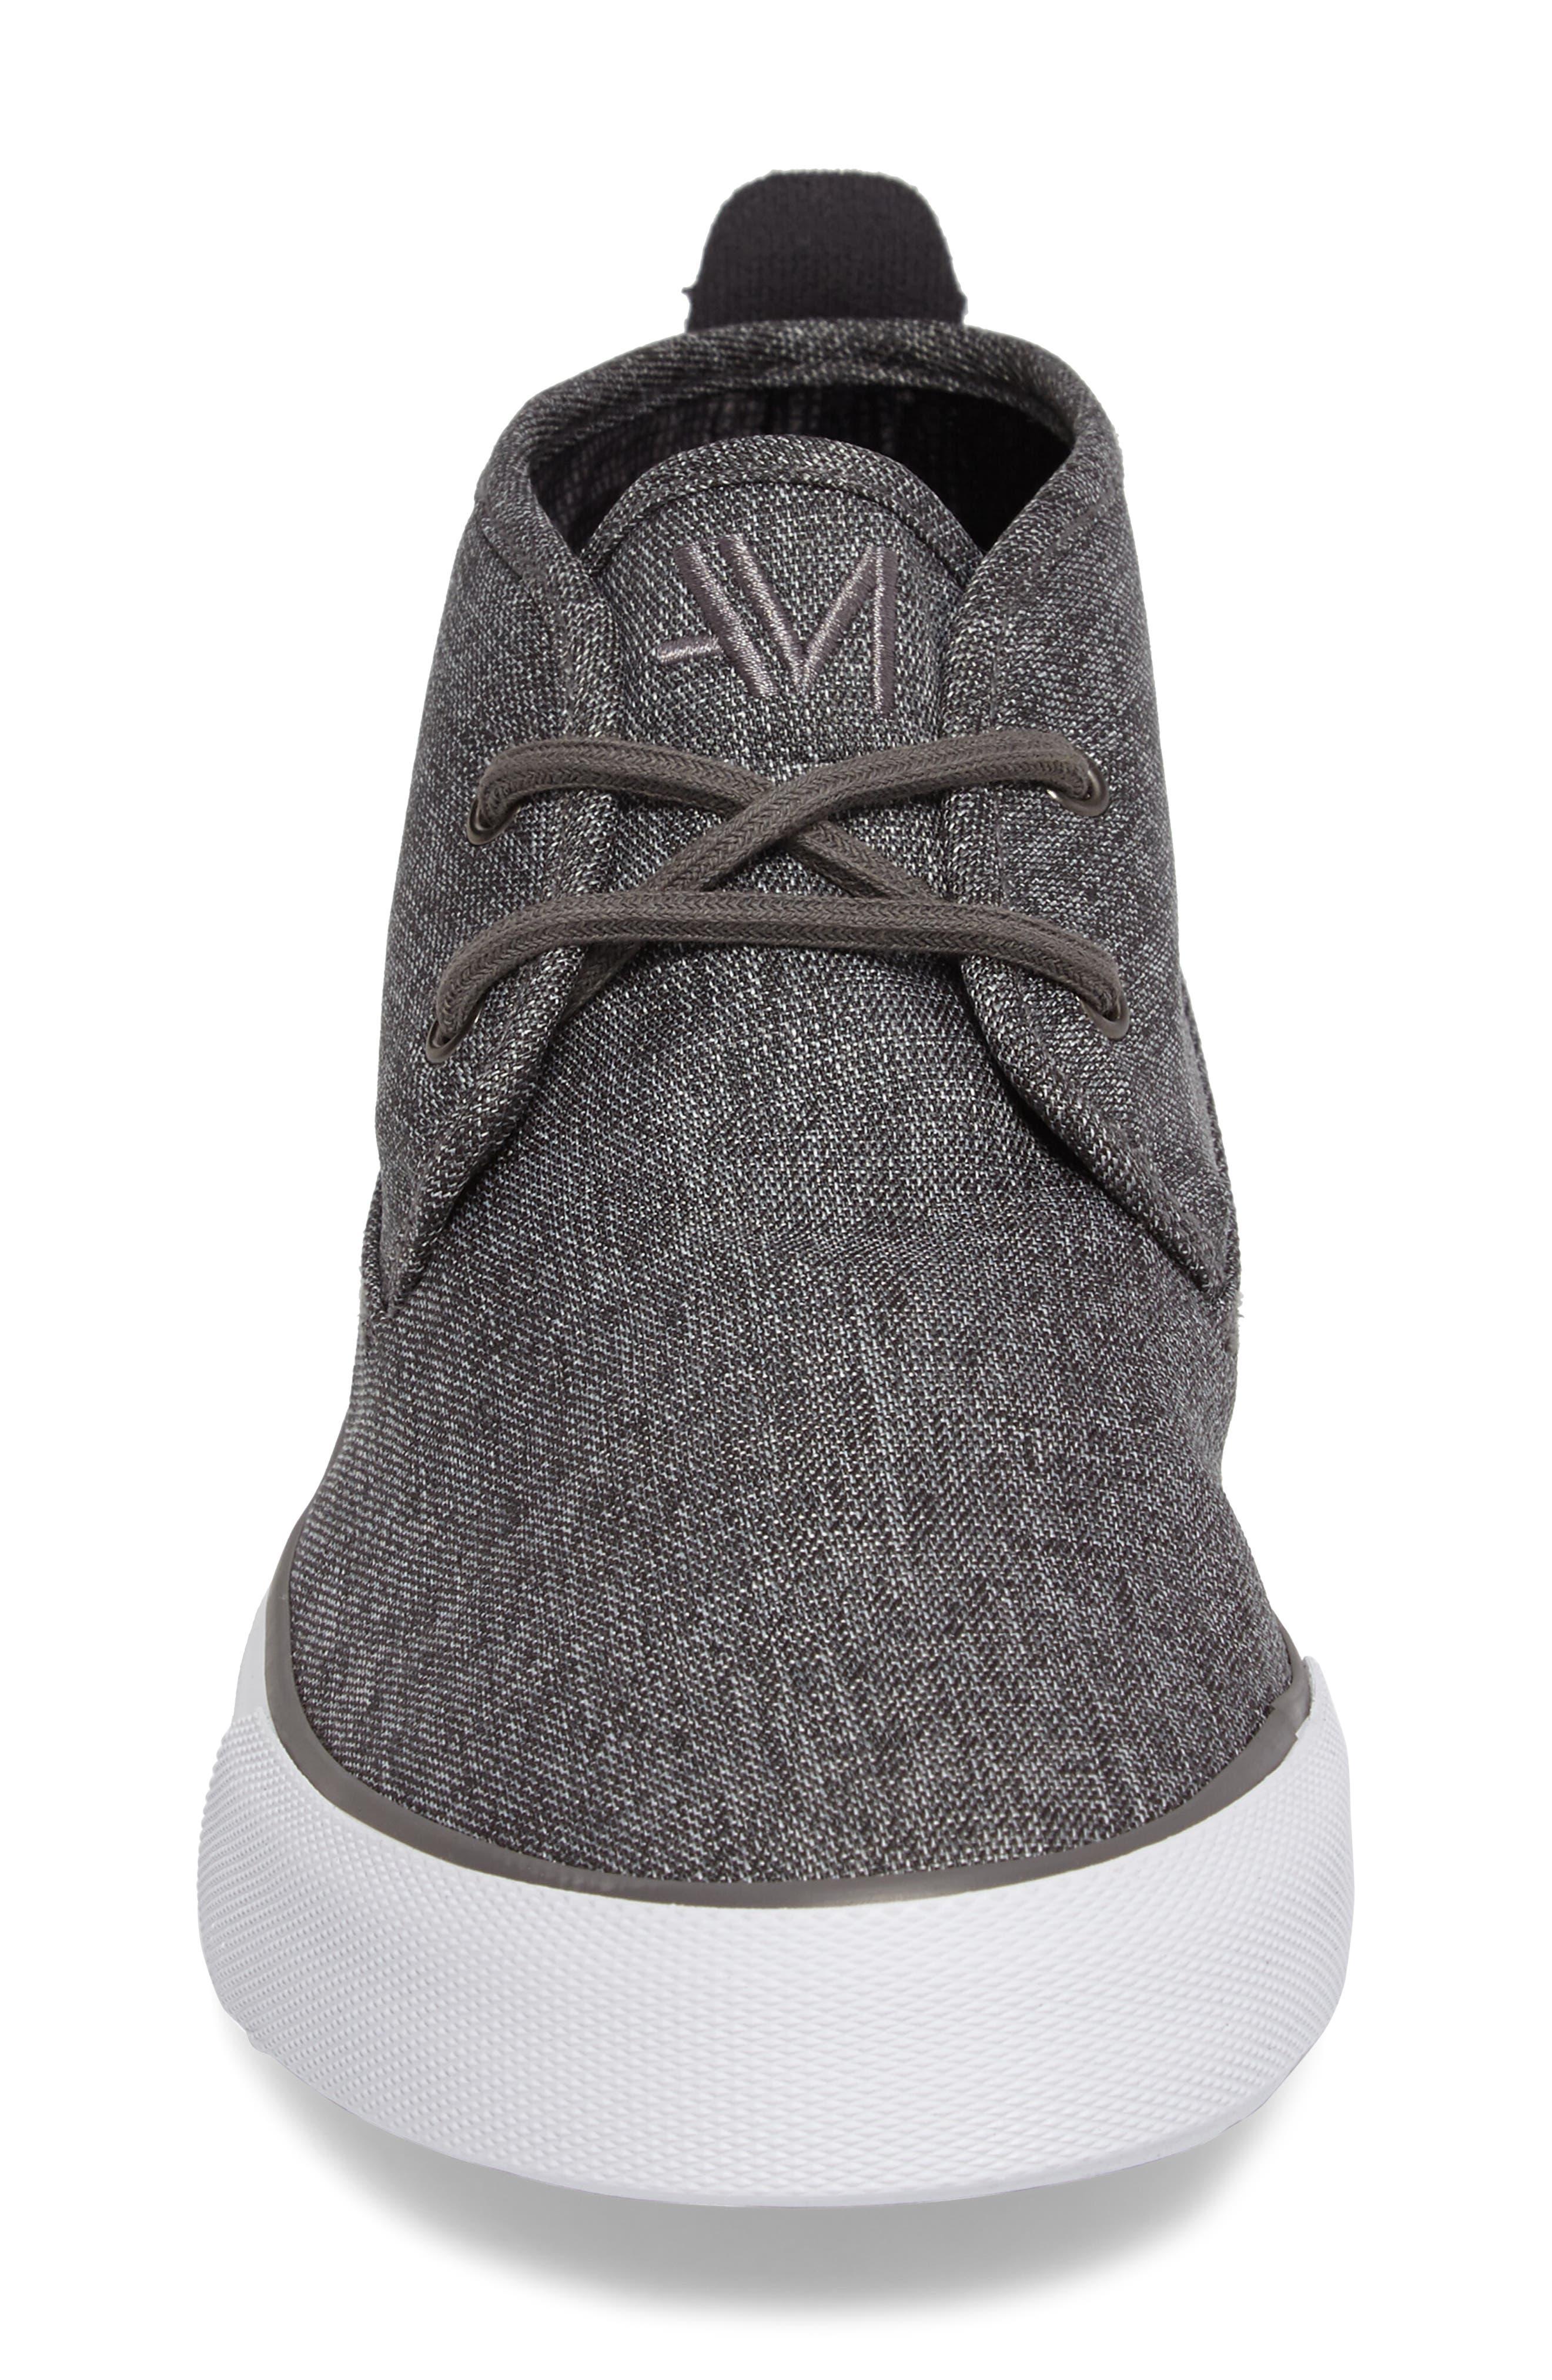 Reade Chukka Sneaker,                             Alternate thumbnail 4, color,                             Charcoal/Dk Charcoal/White